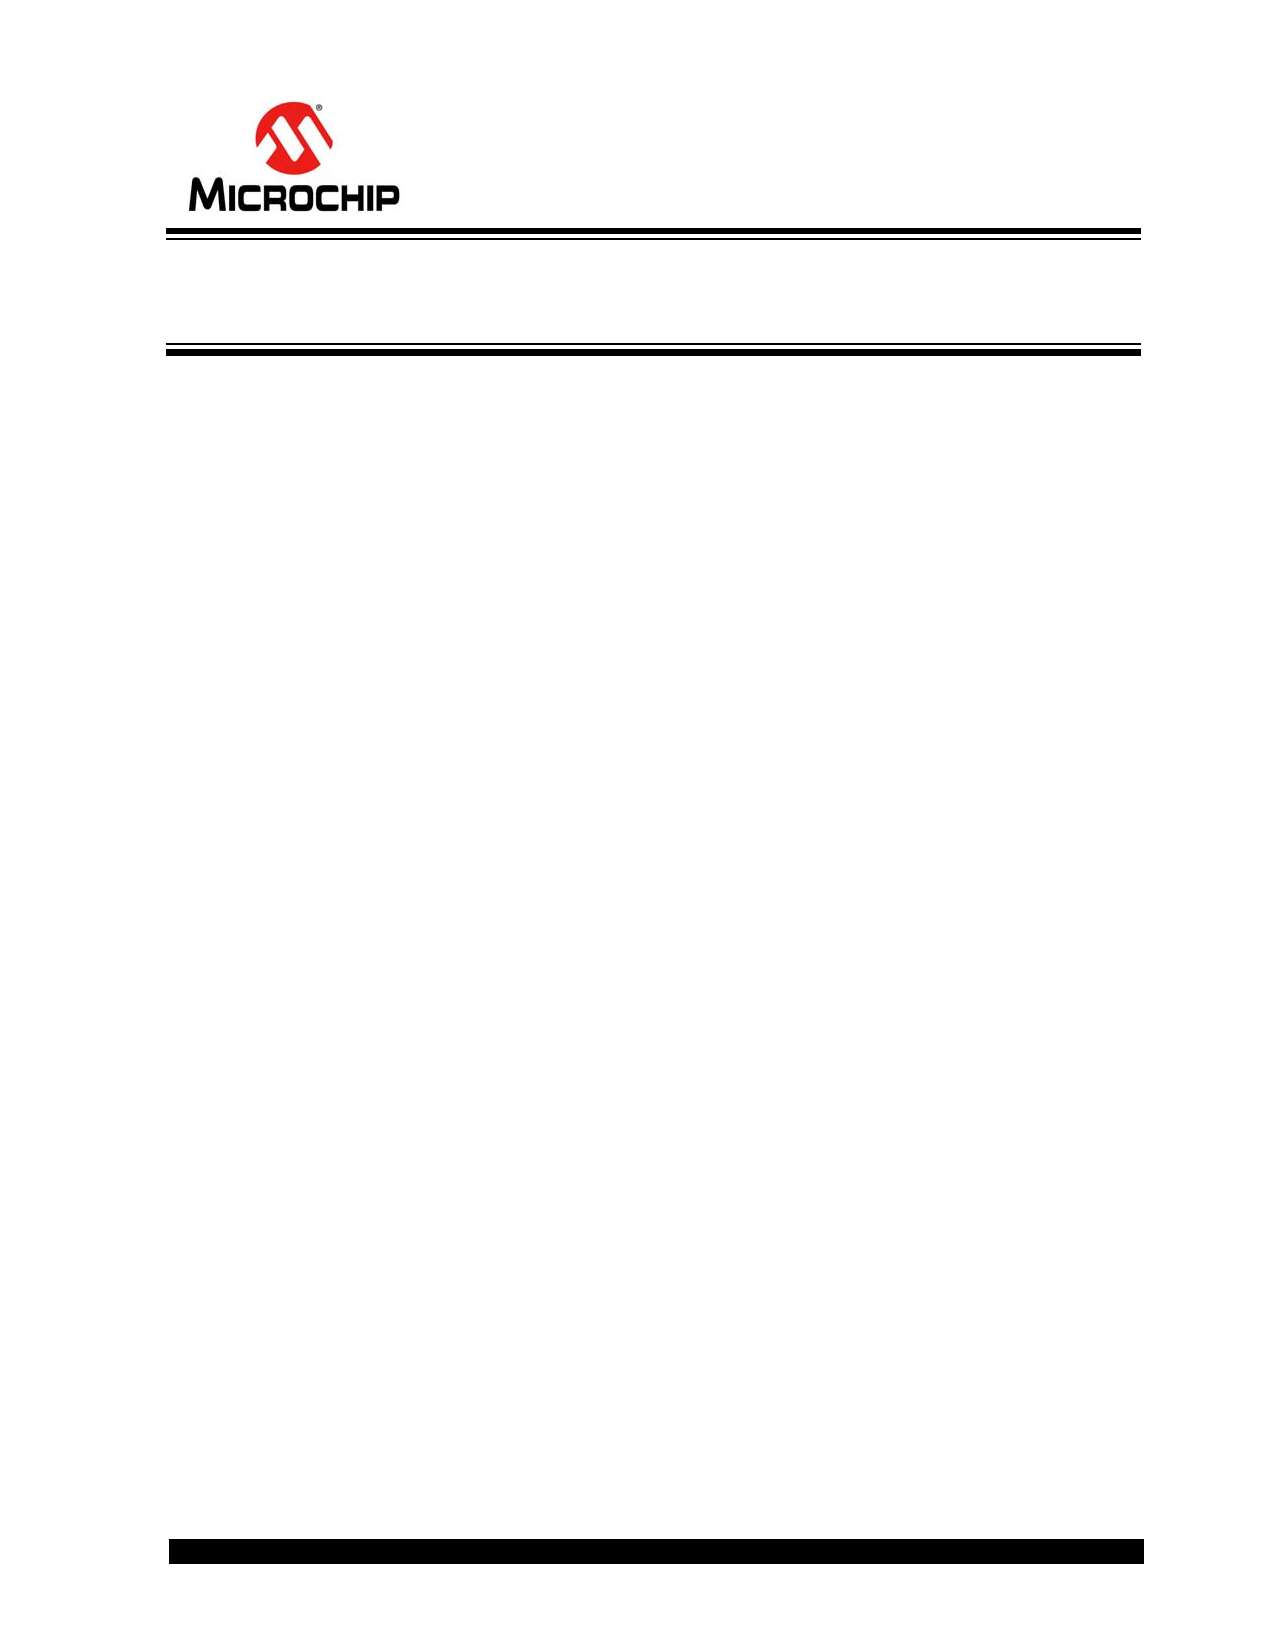 PIC24F16KA301 데이터시트 및 PIC24F16KA301 PDF